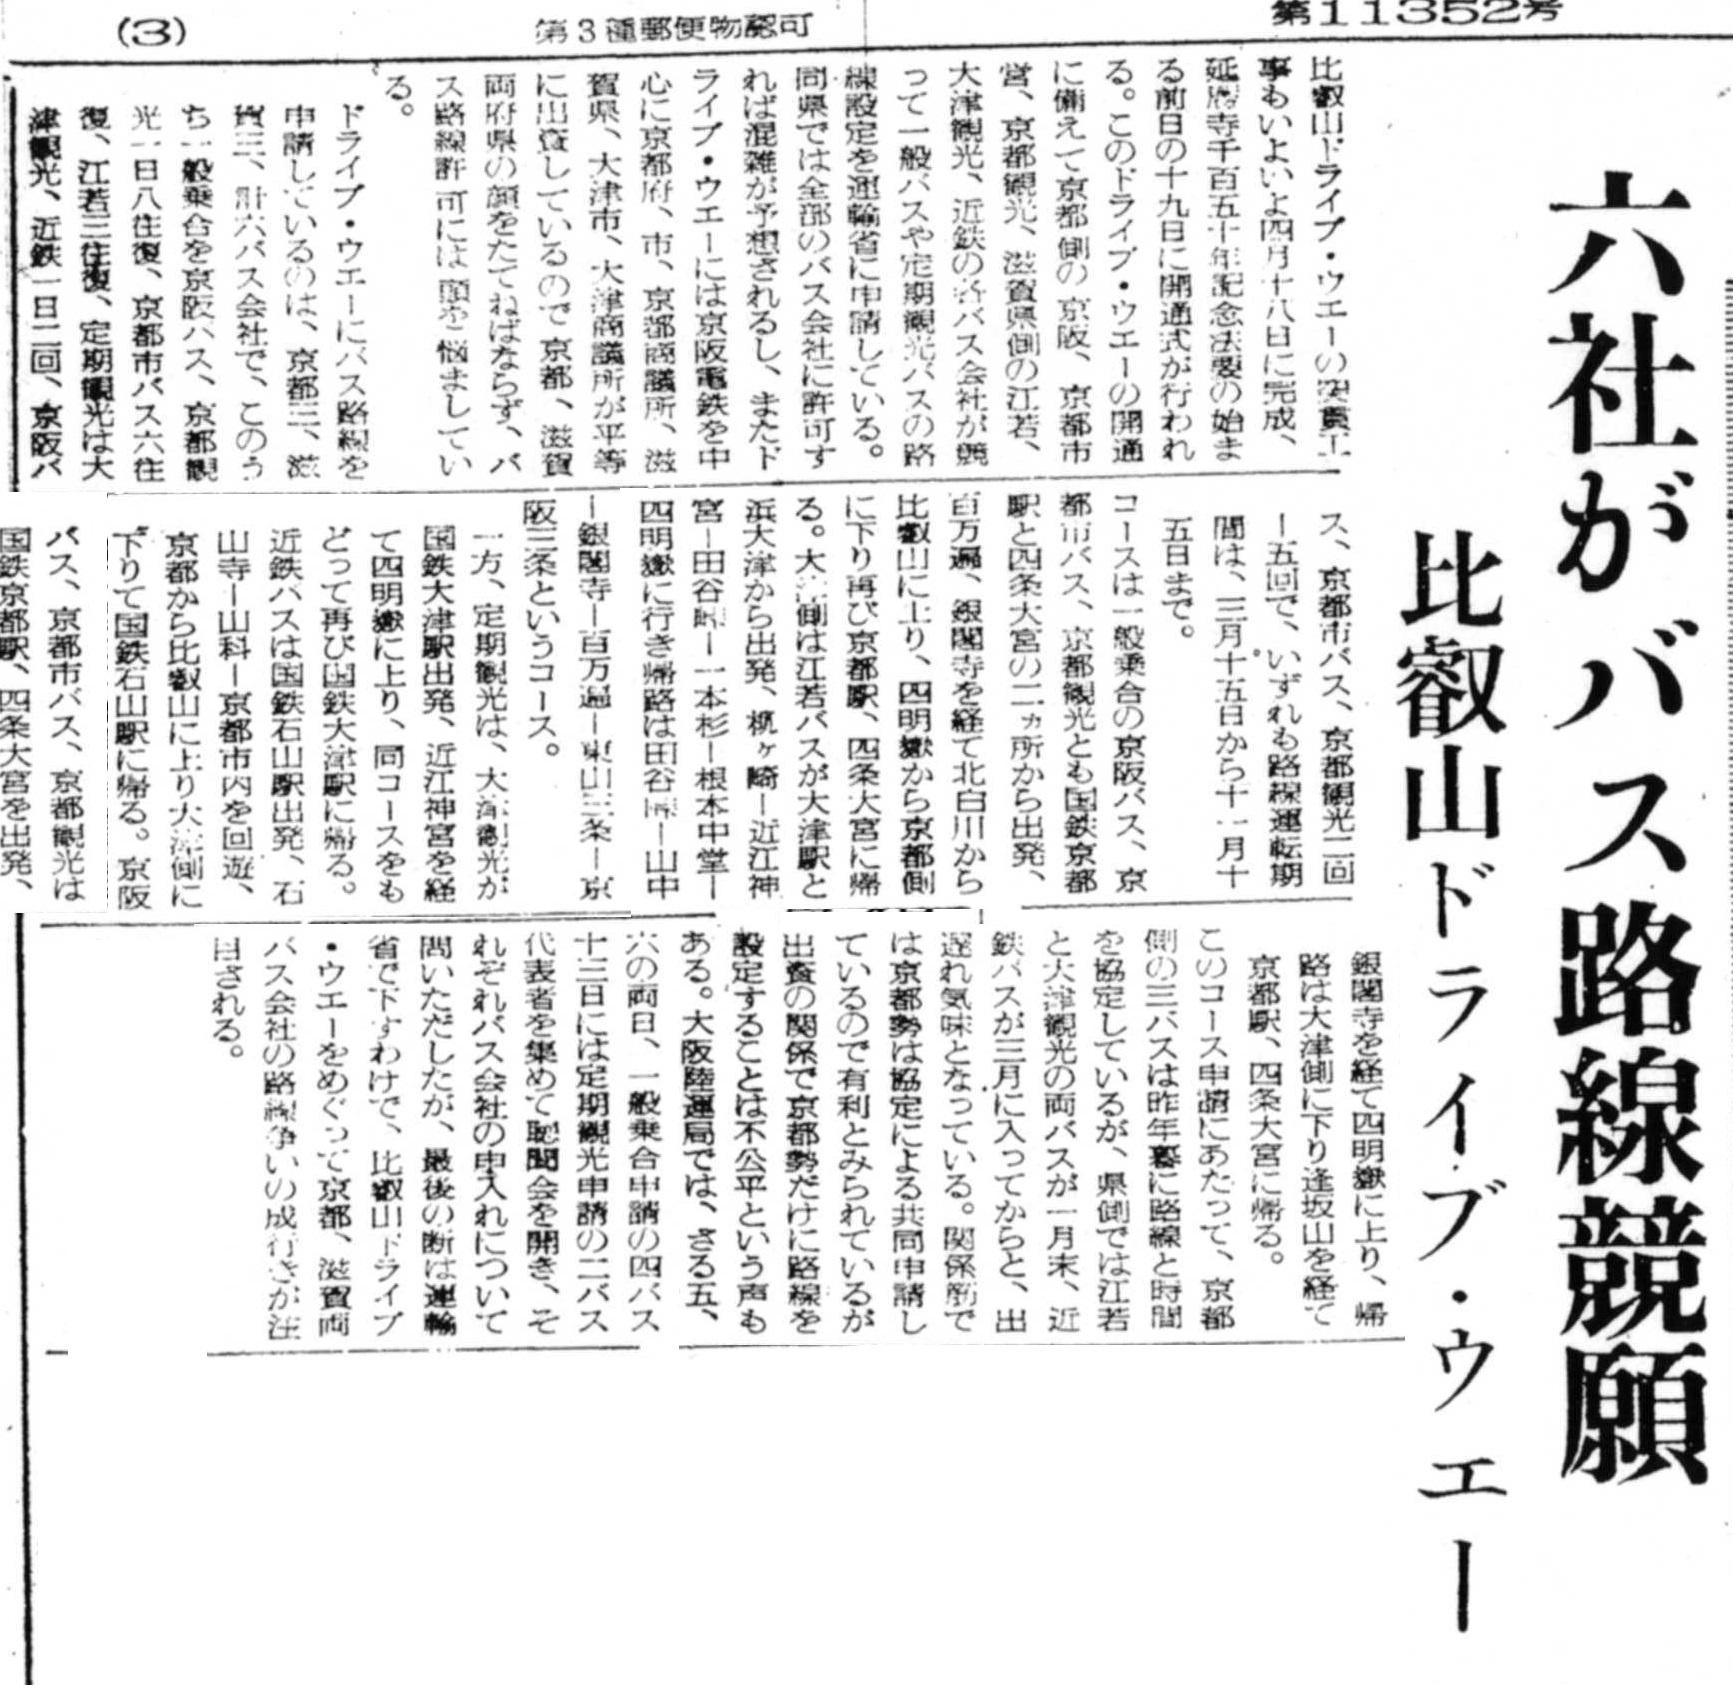 S33.3.17S 比叡山DWバス路線競願b